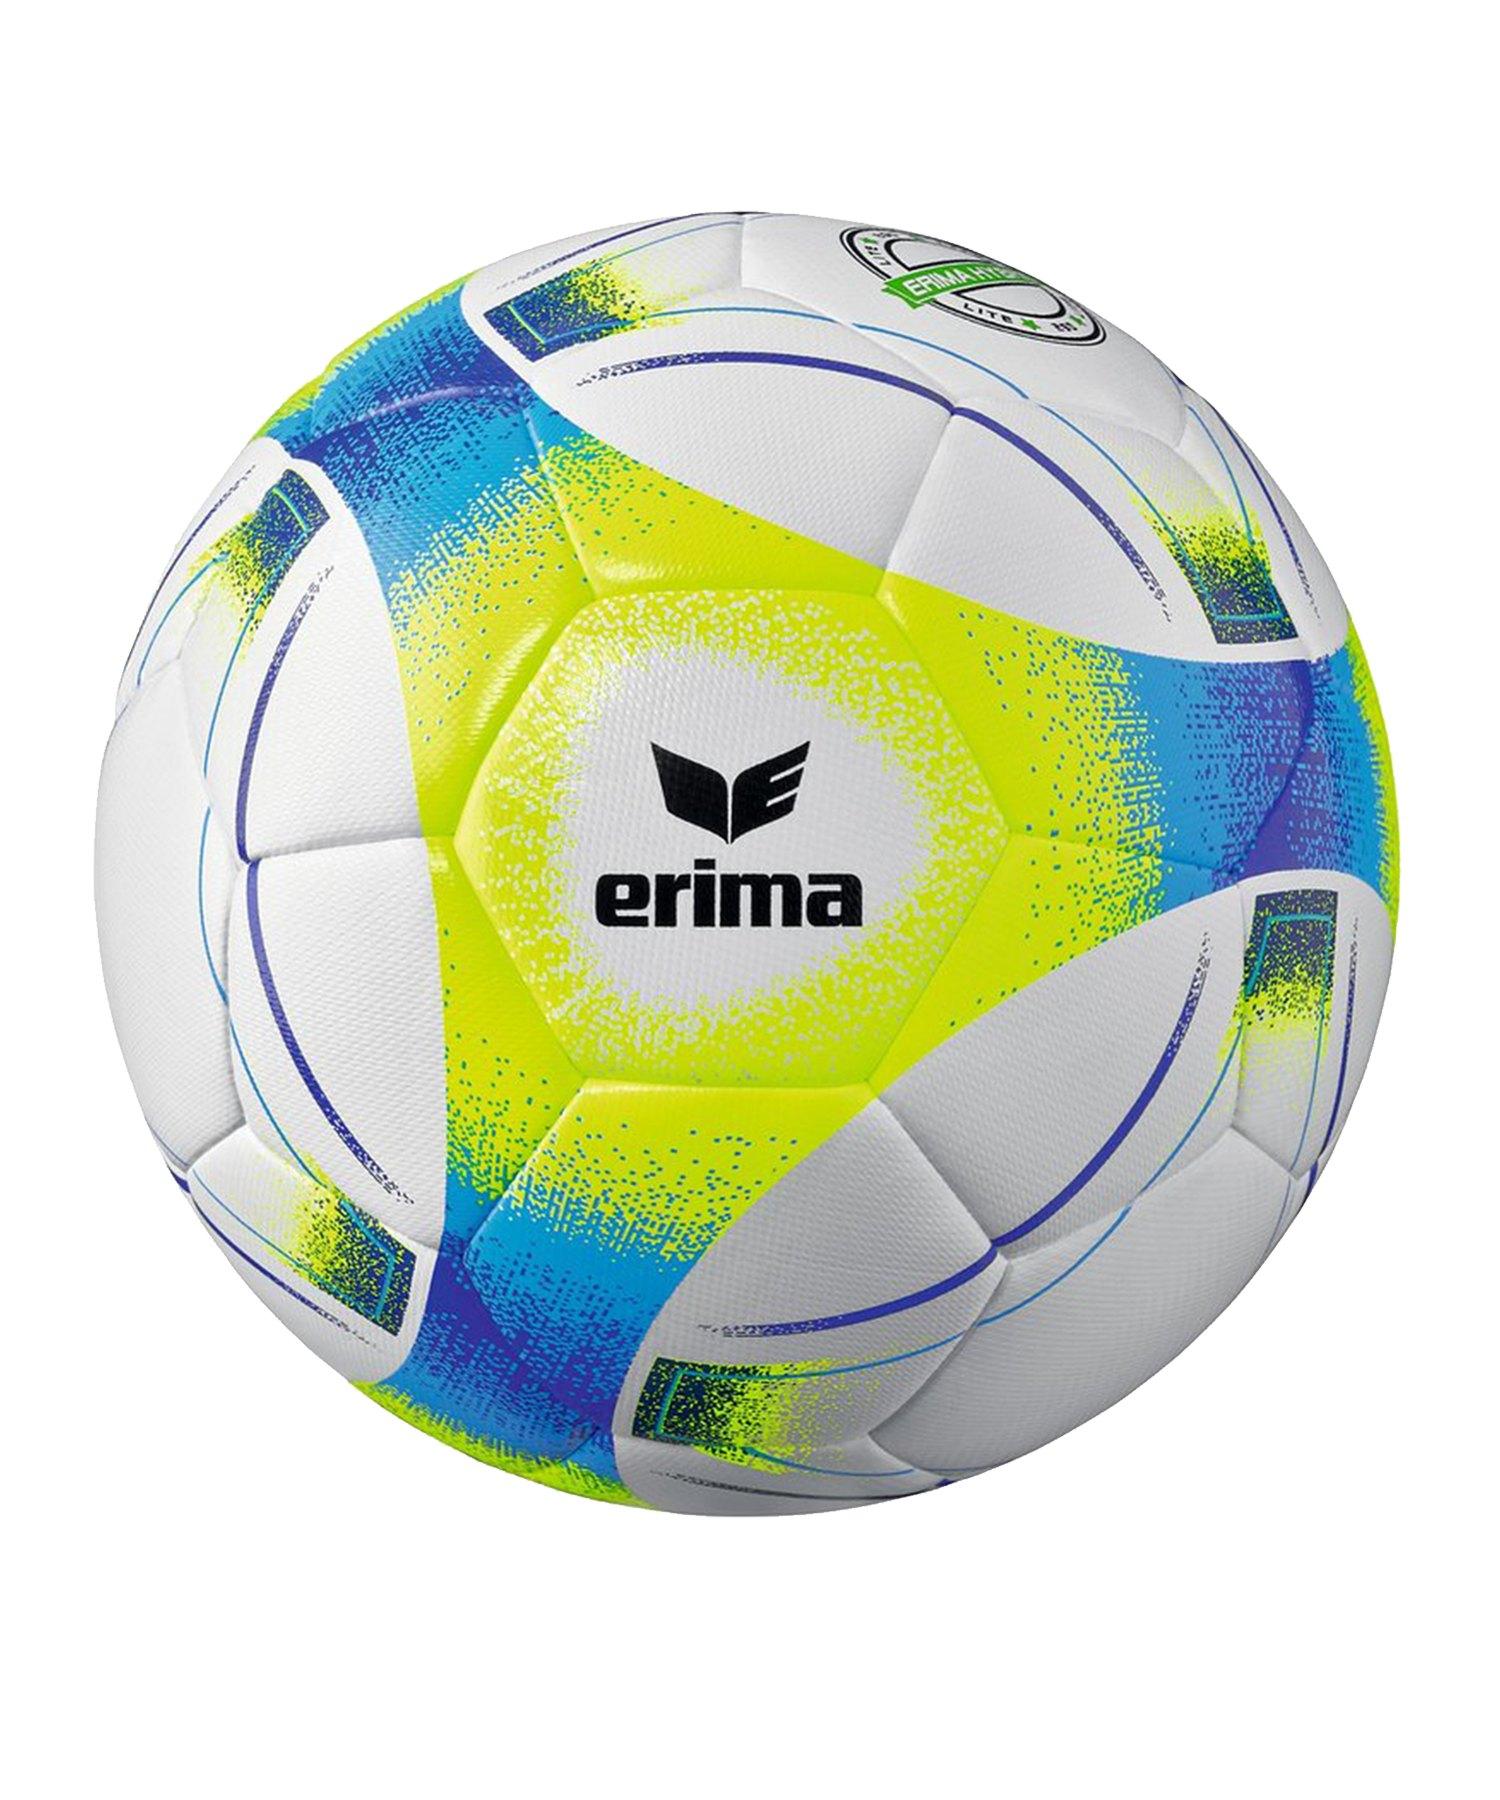 Erima ERIMA Hybrid Lite 290 Gr. 4 Gelb Blau - Gelb